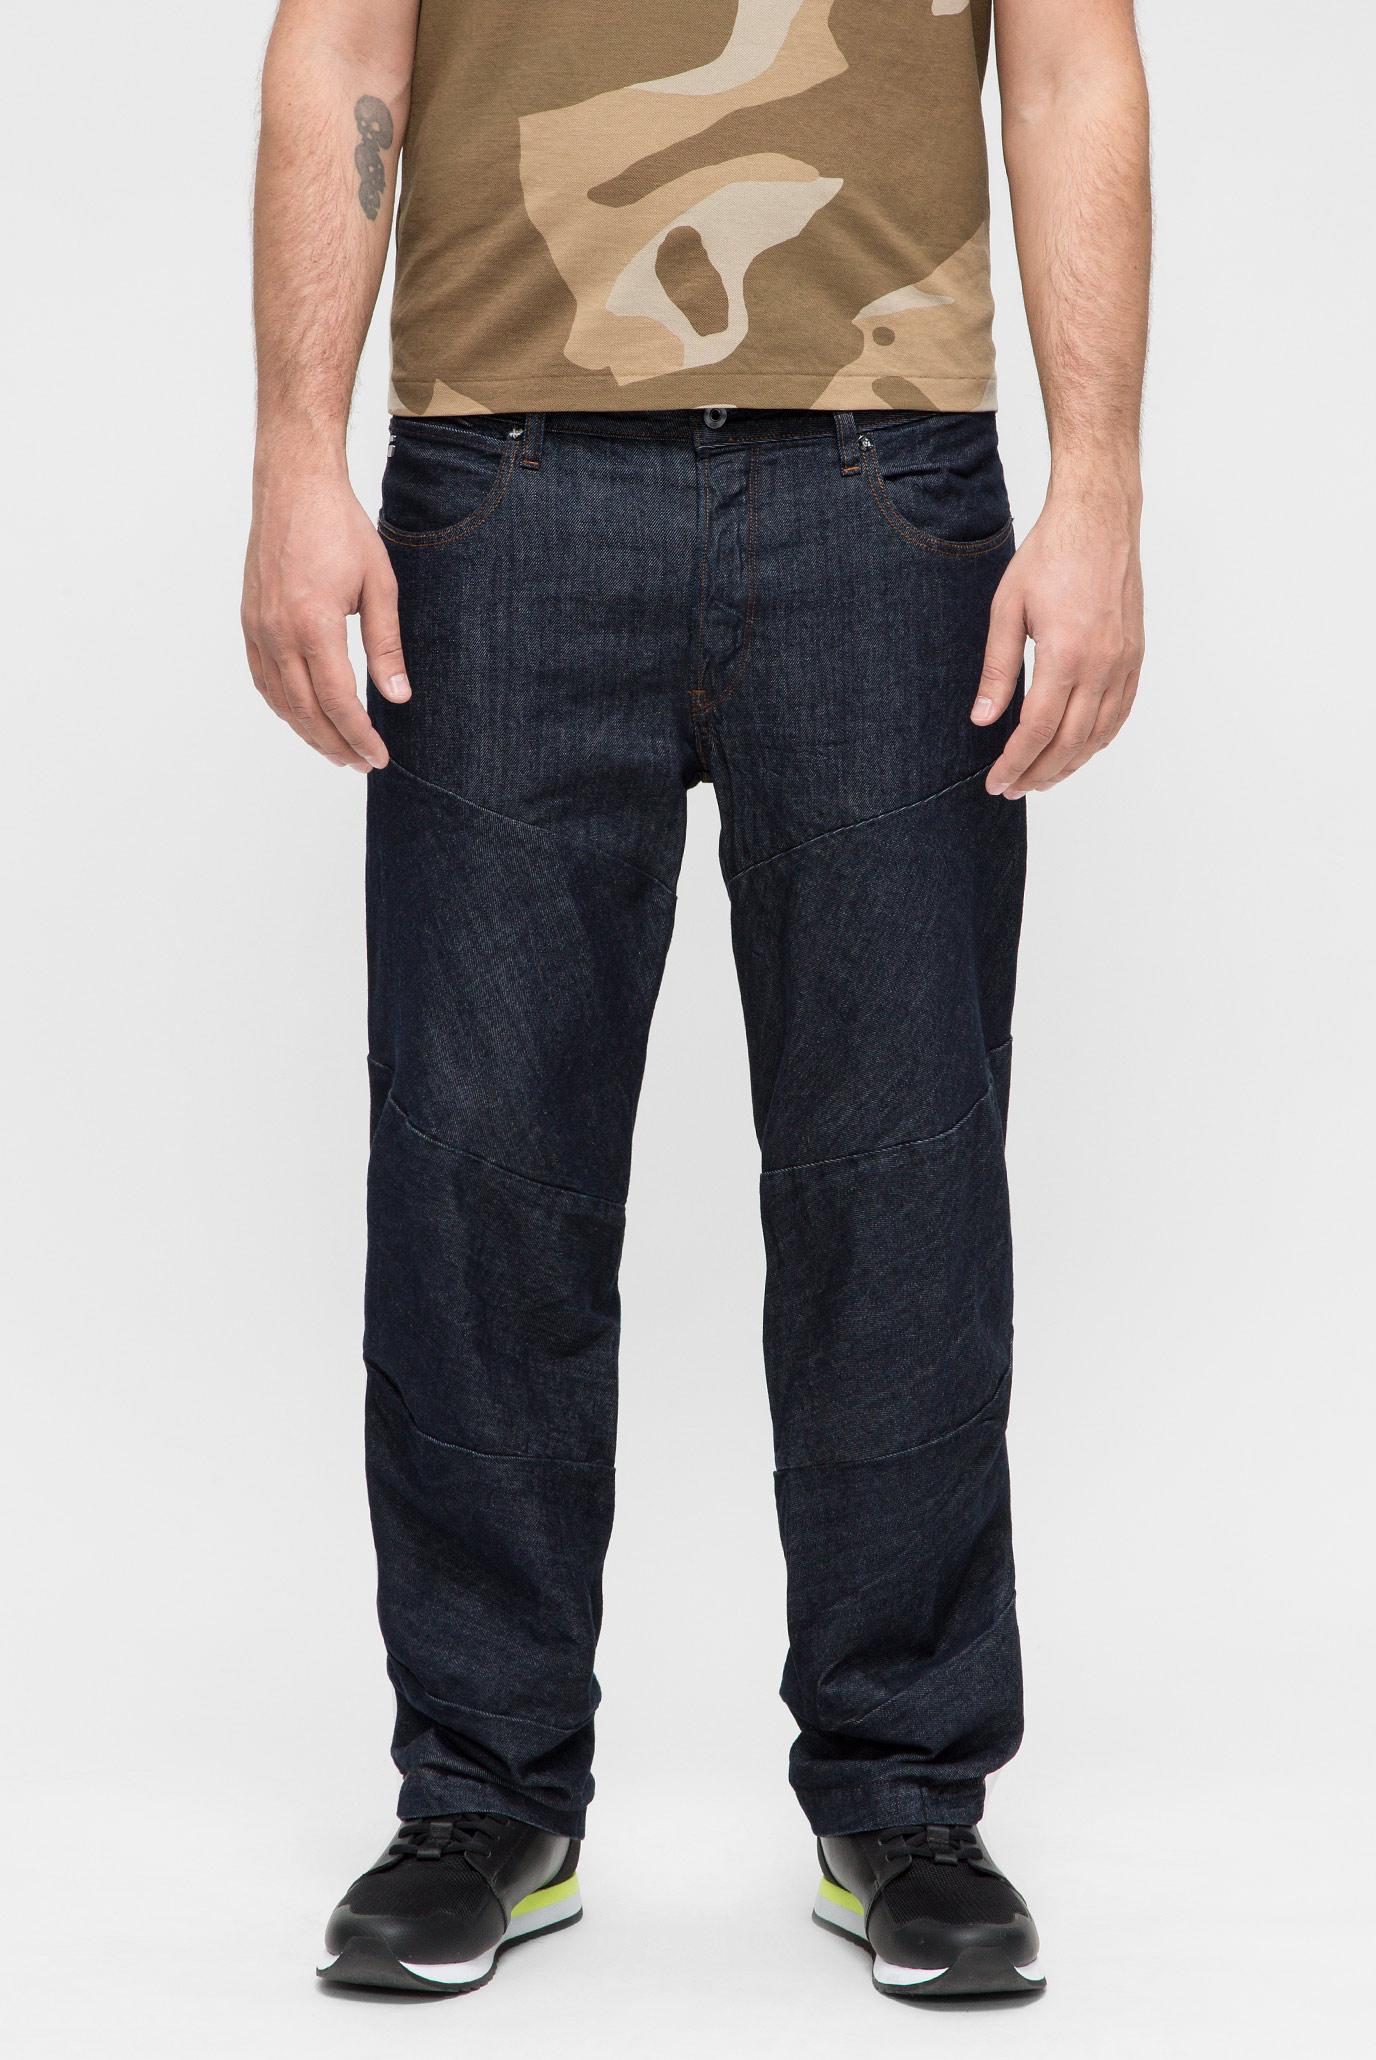 Мужские темно-синие джинсы Spiraq 3D Loose 1